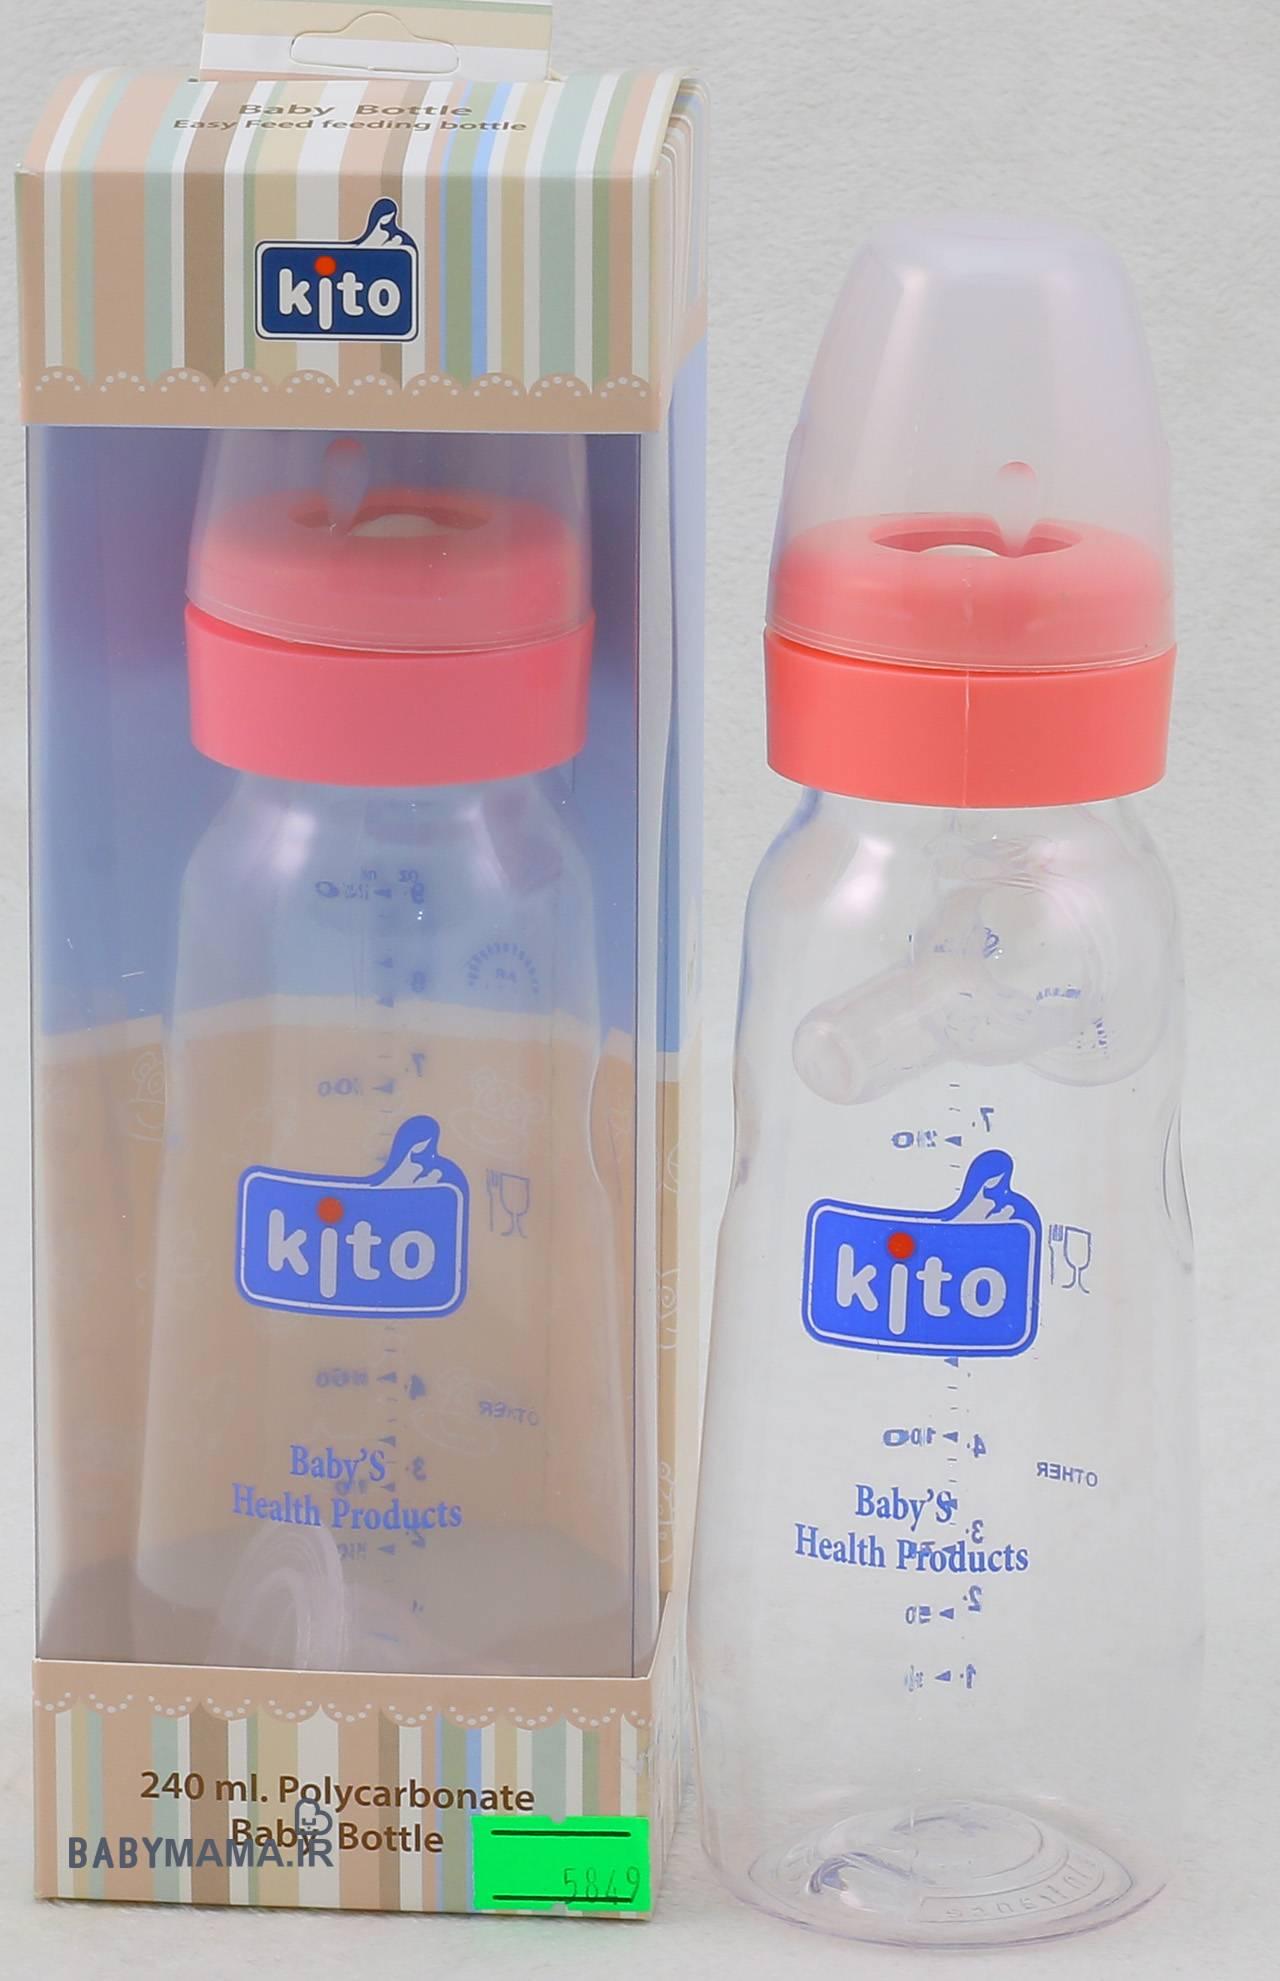 بطری شیر خوری ۲۴۰ میلی لیتری کیتو